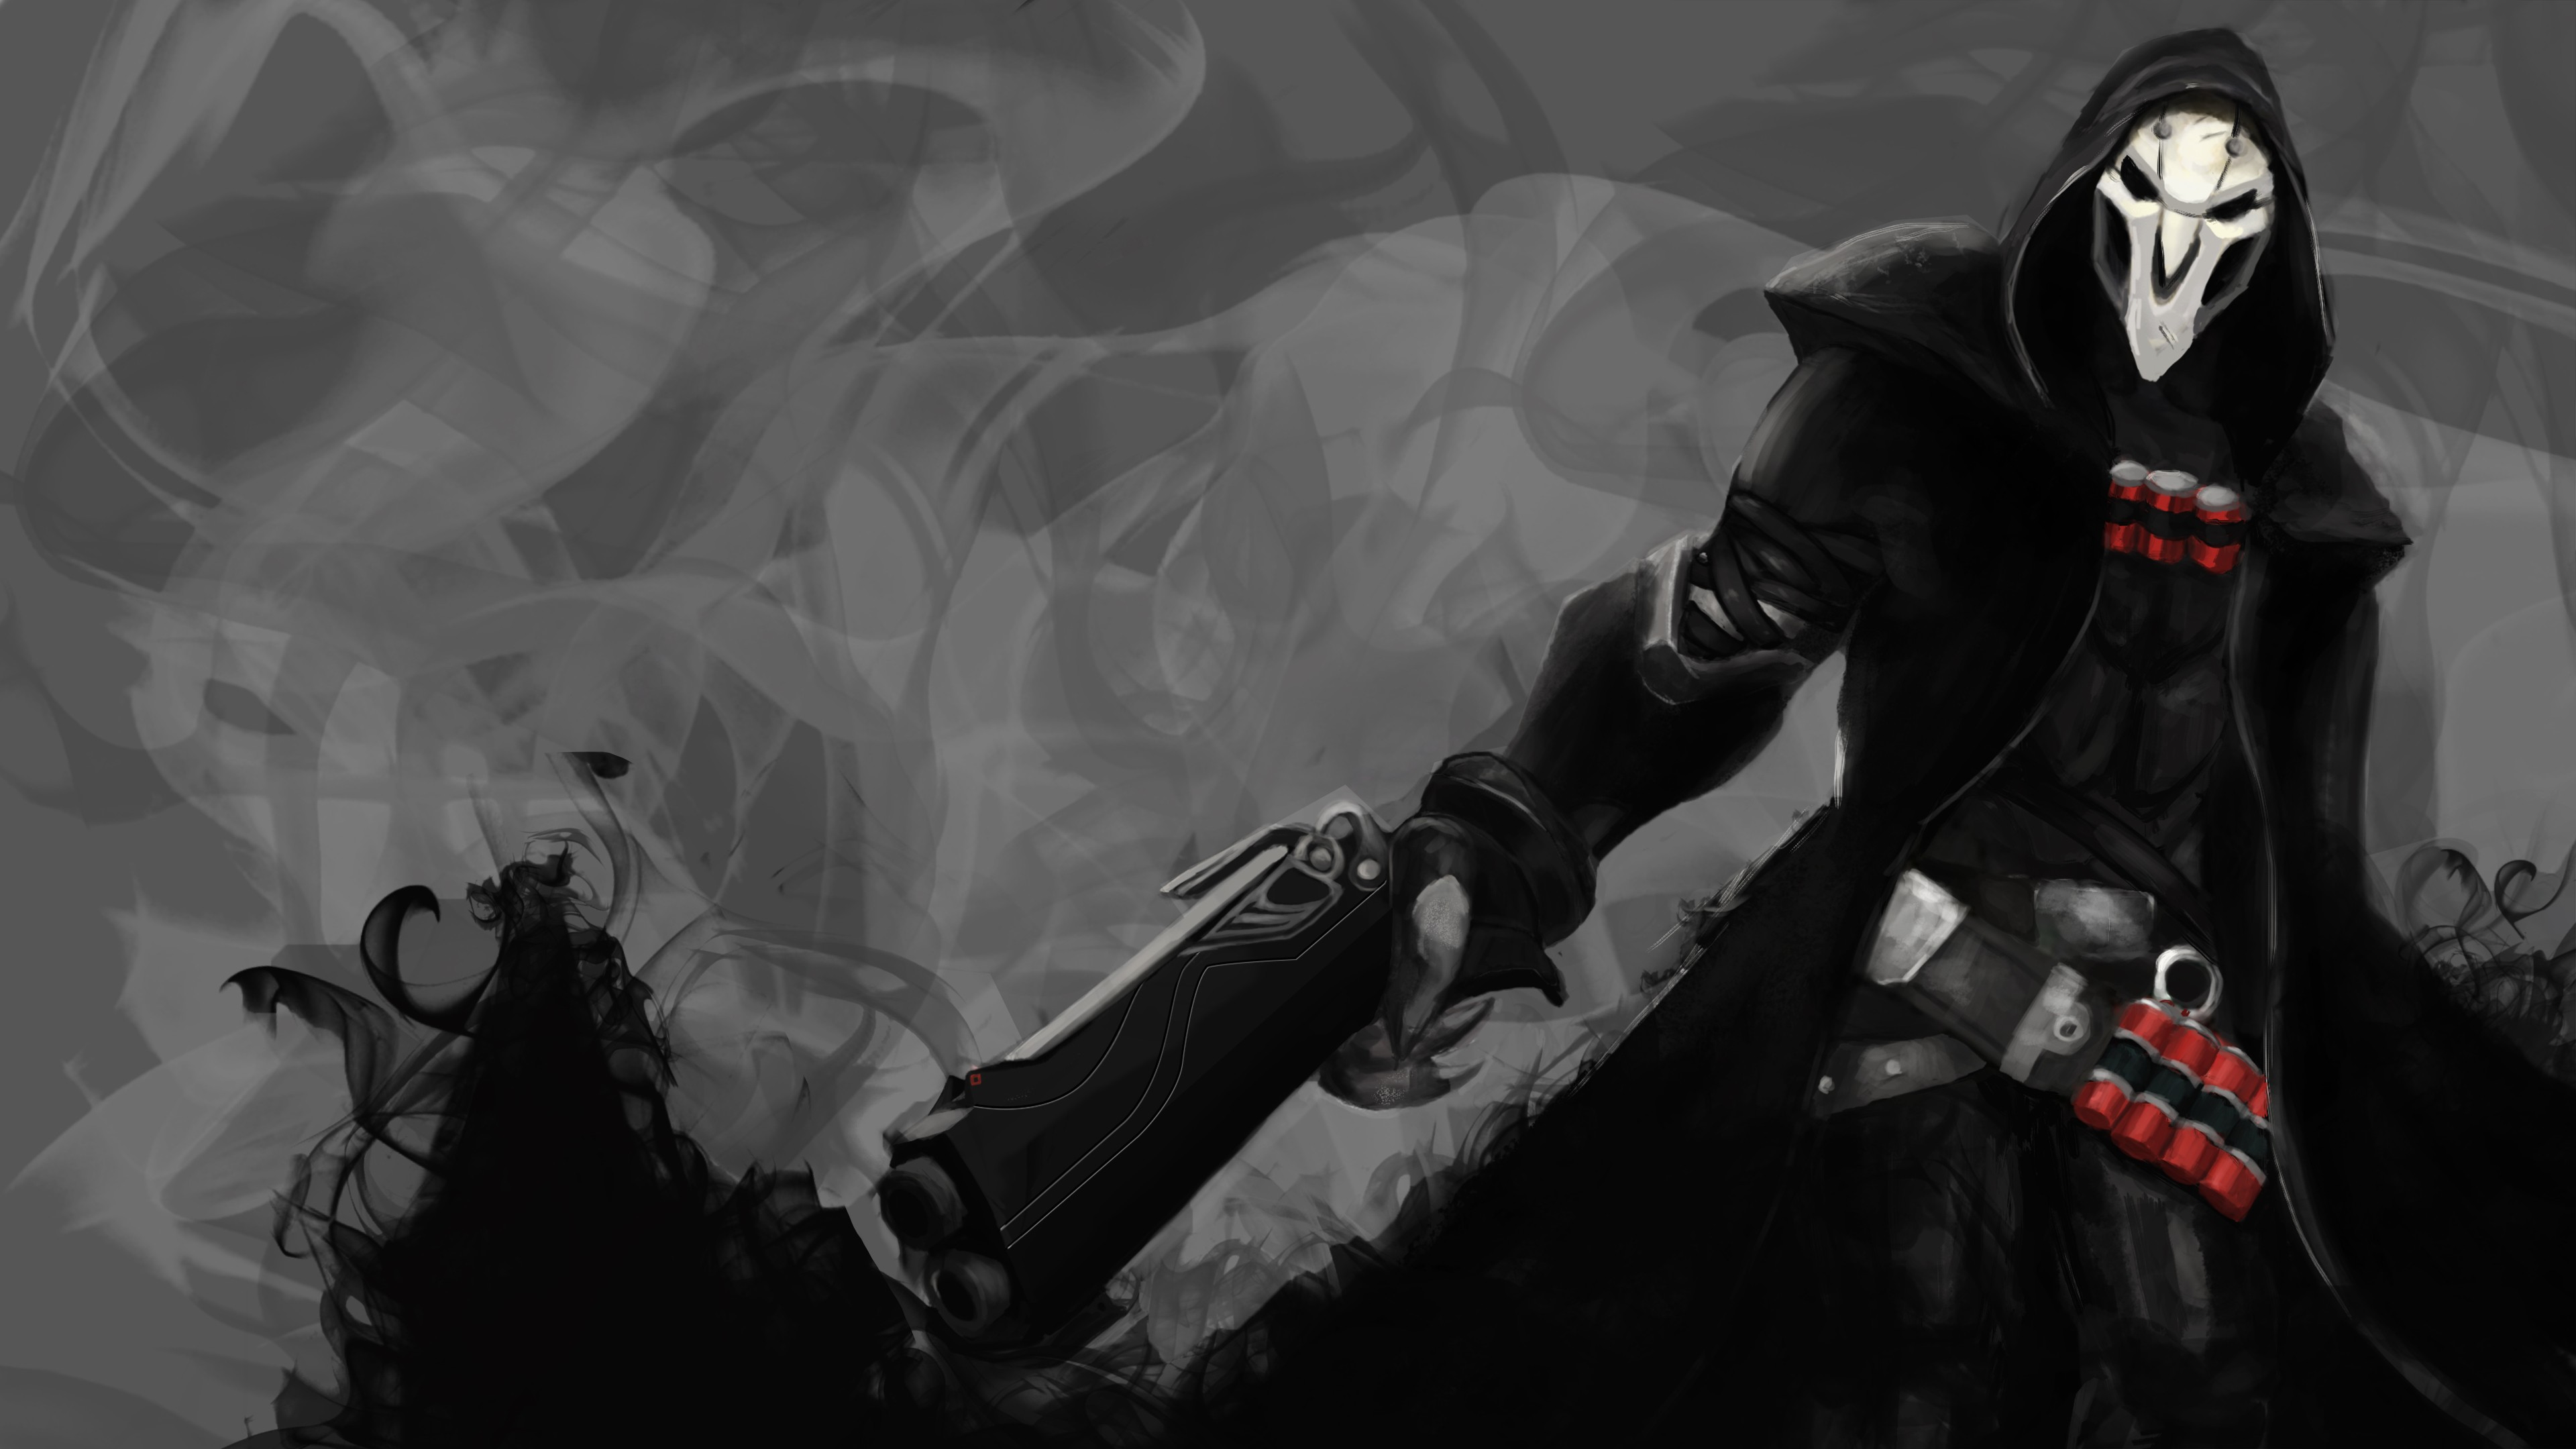 1400x900 Reaper Overwatch 4k 1400x900 Resolution Hd 4k